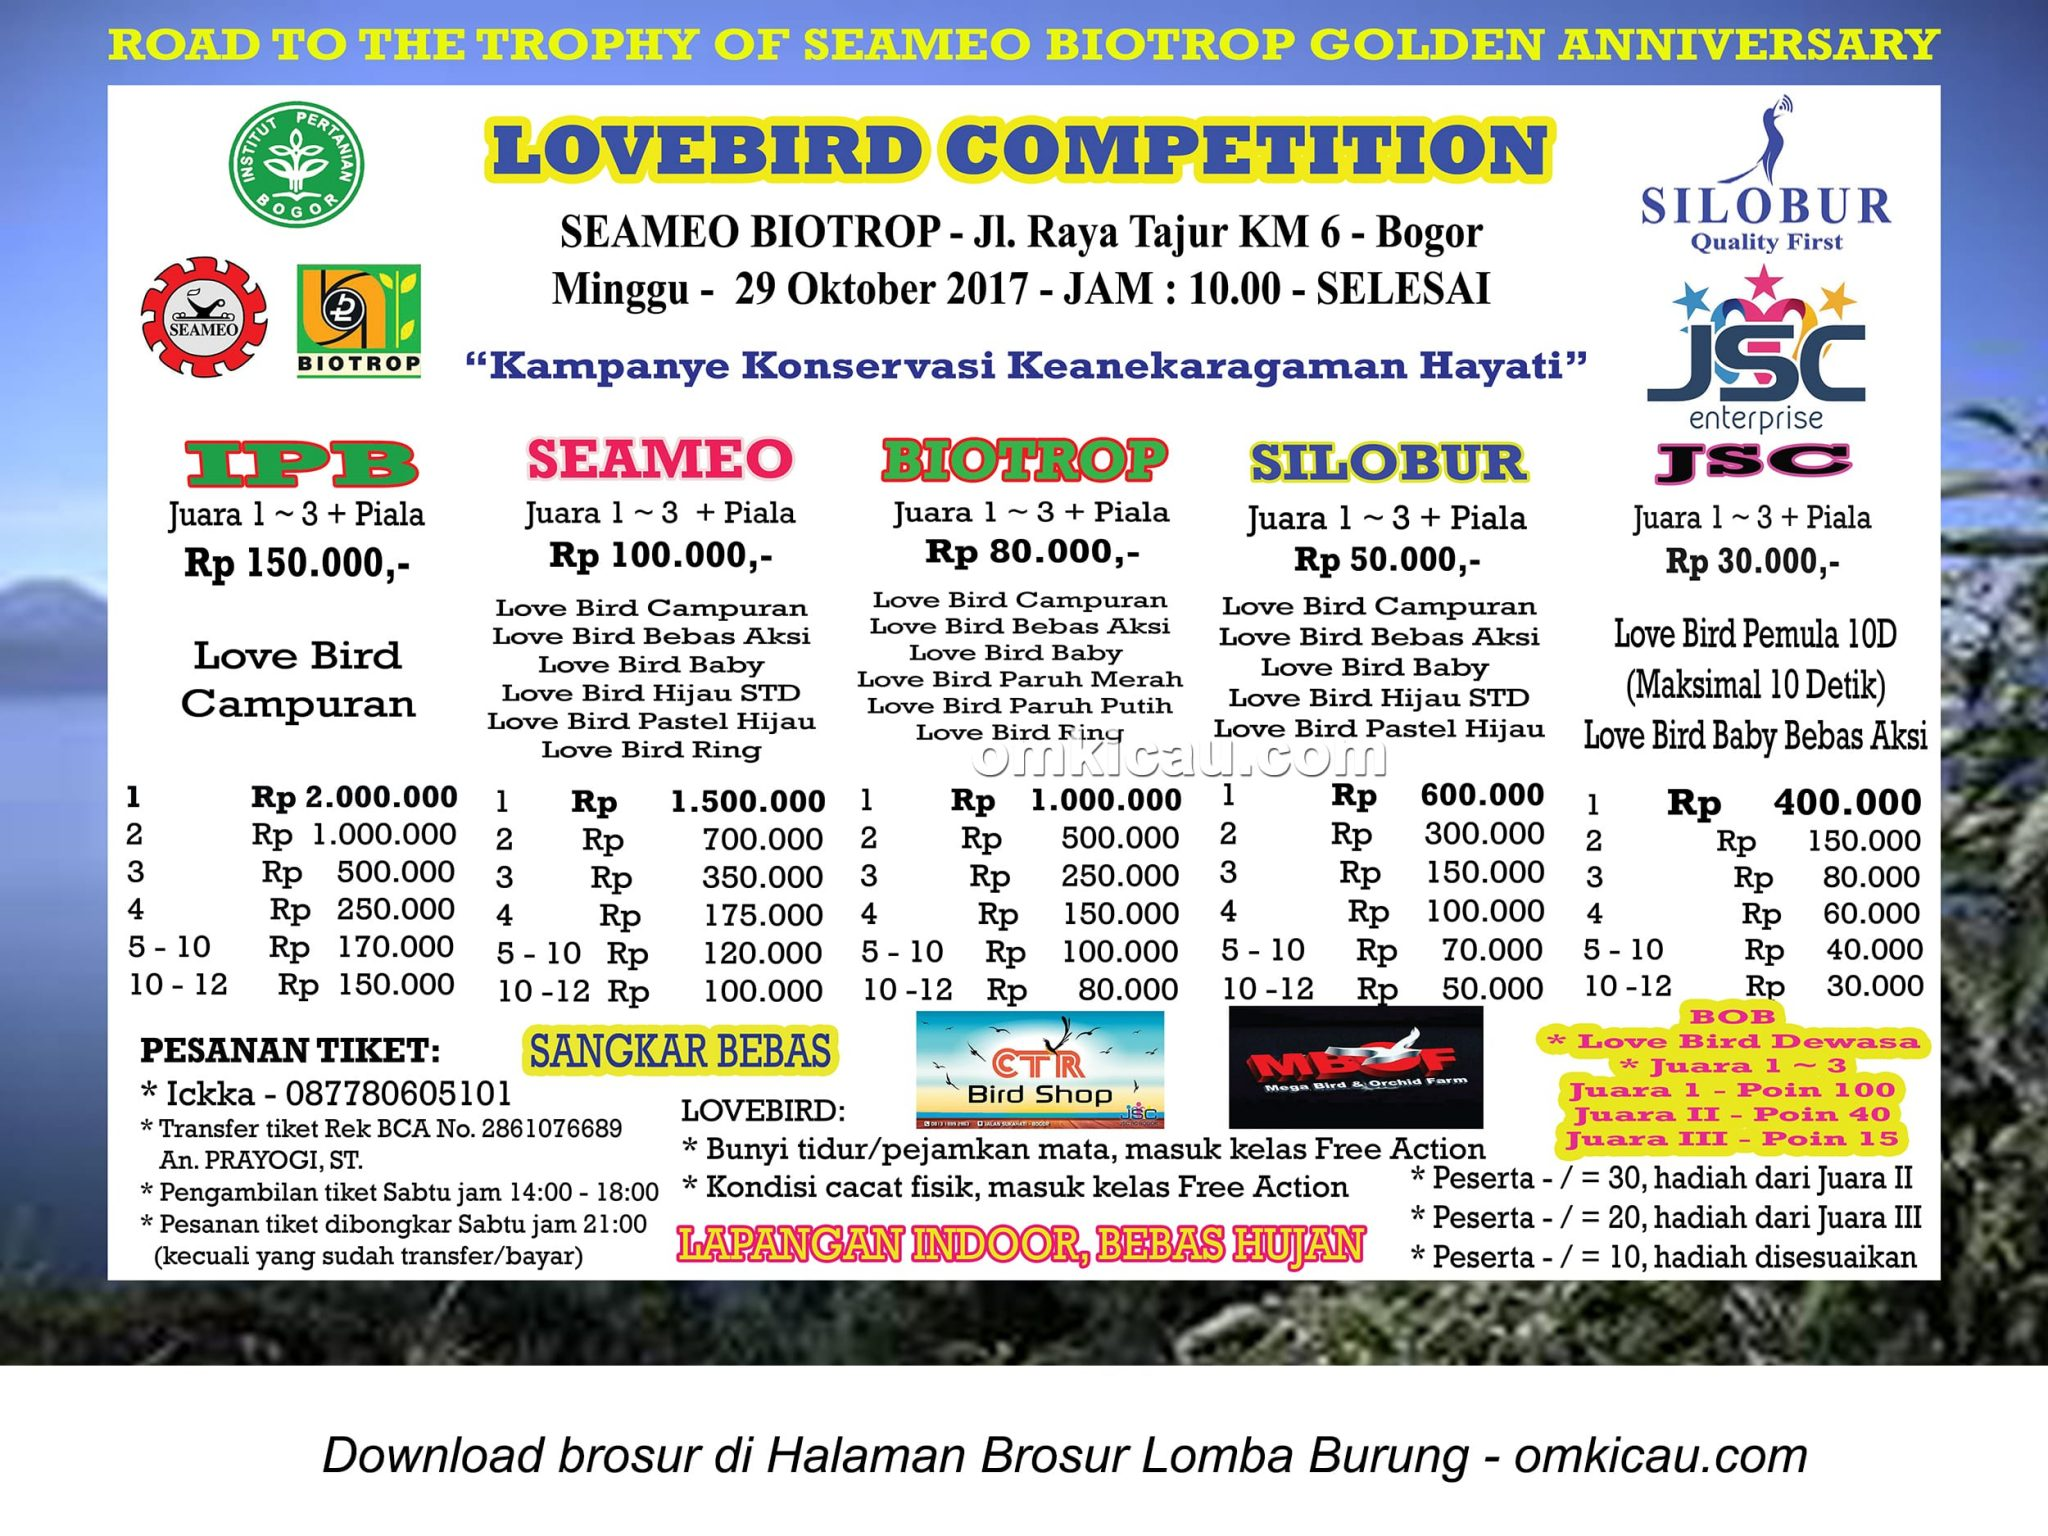 lovebird competition seameo biotrop